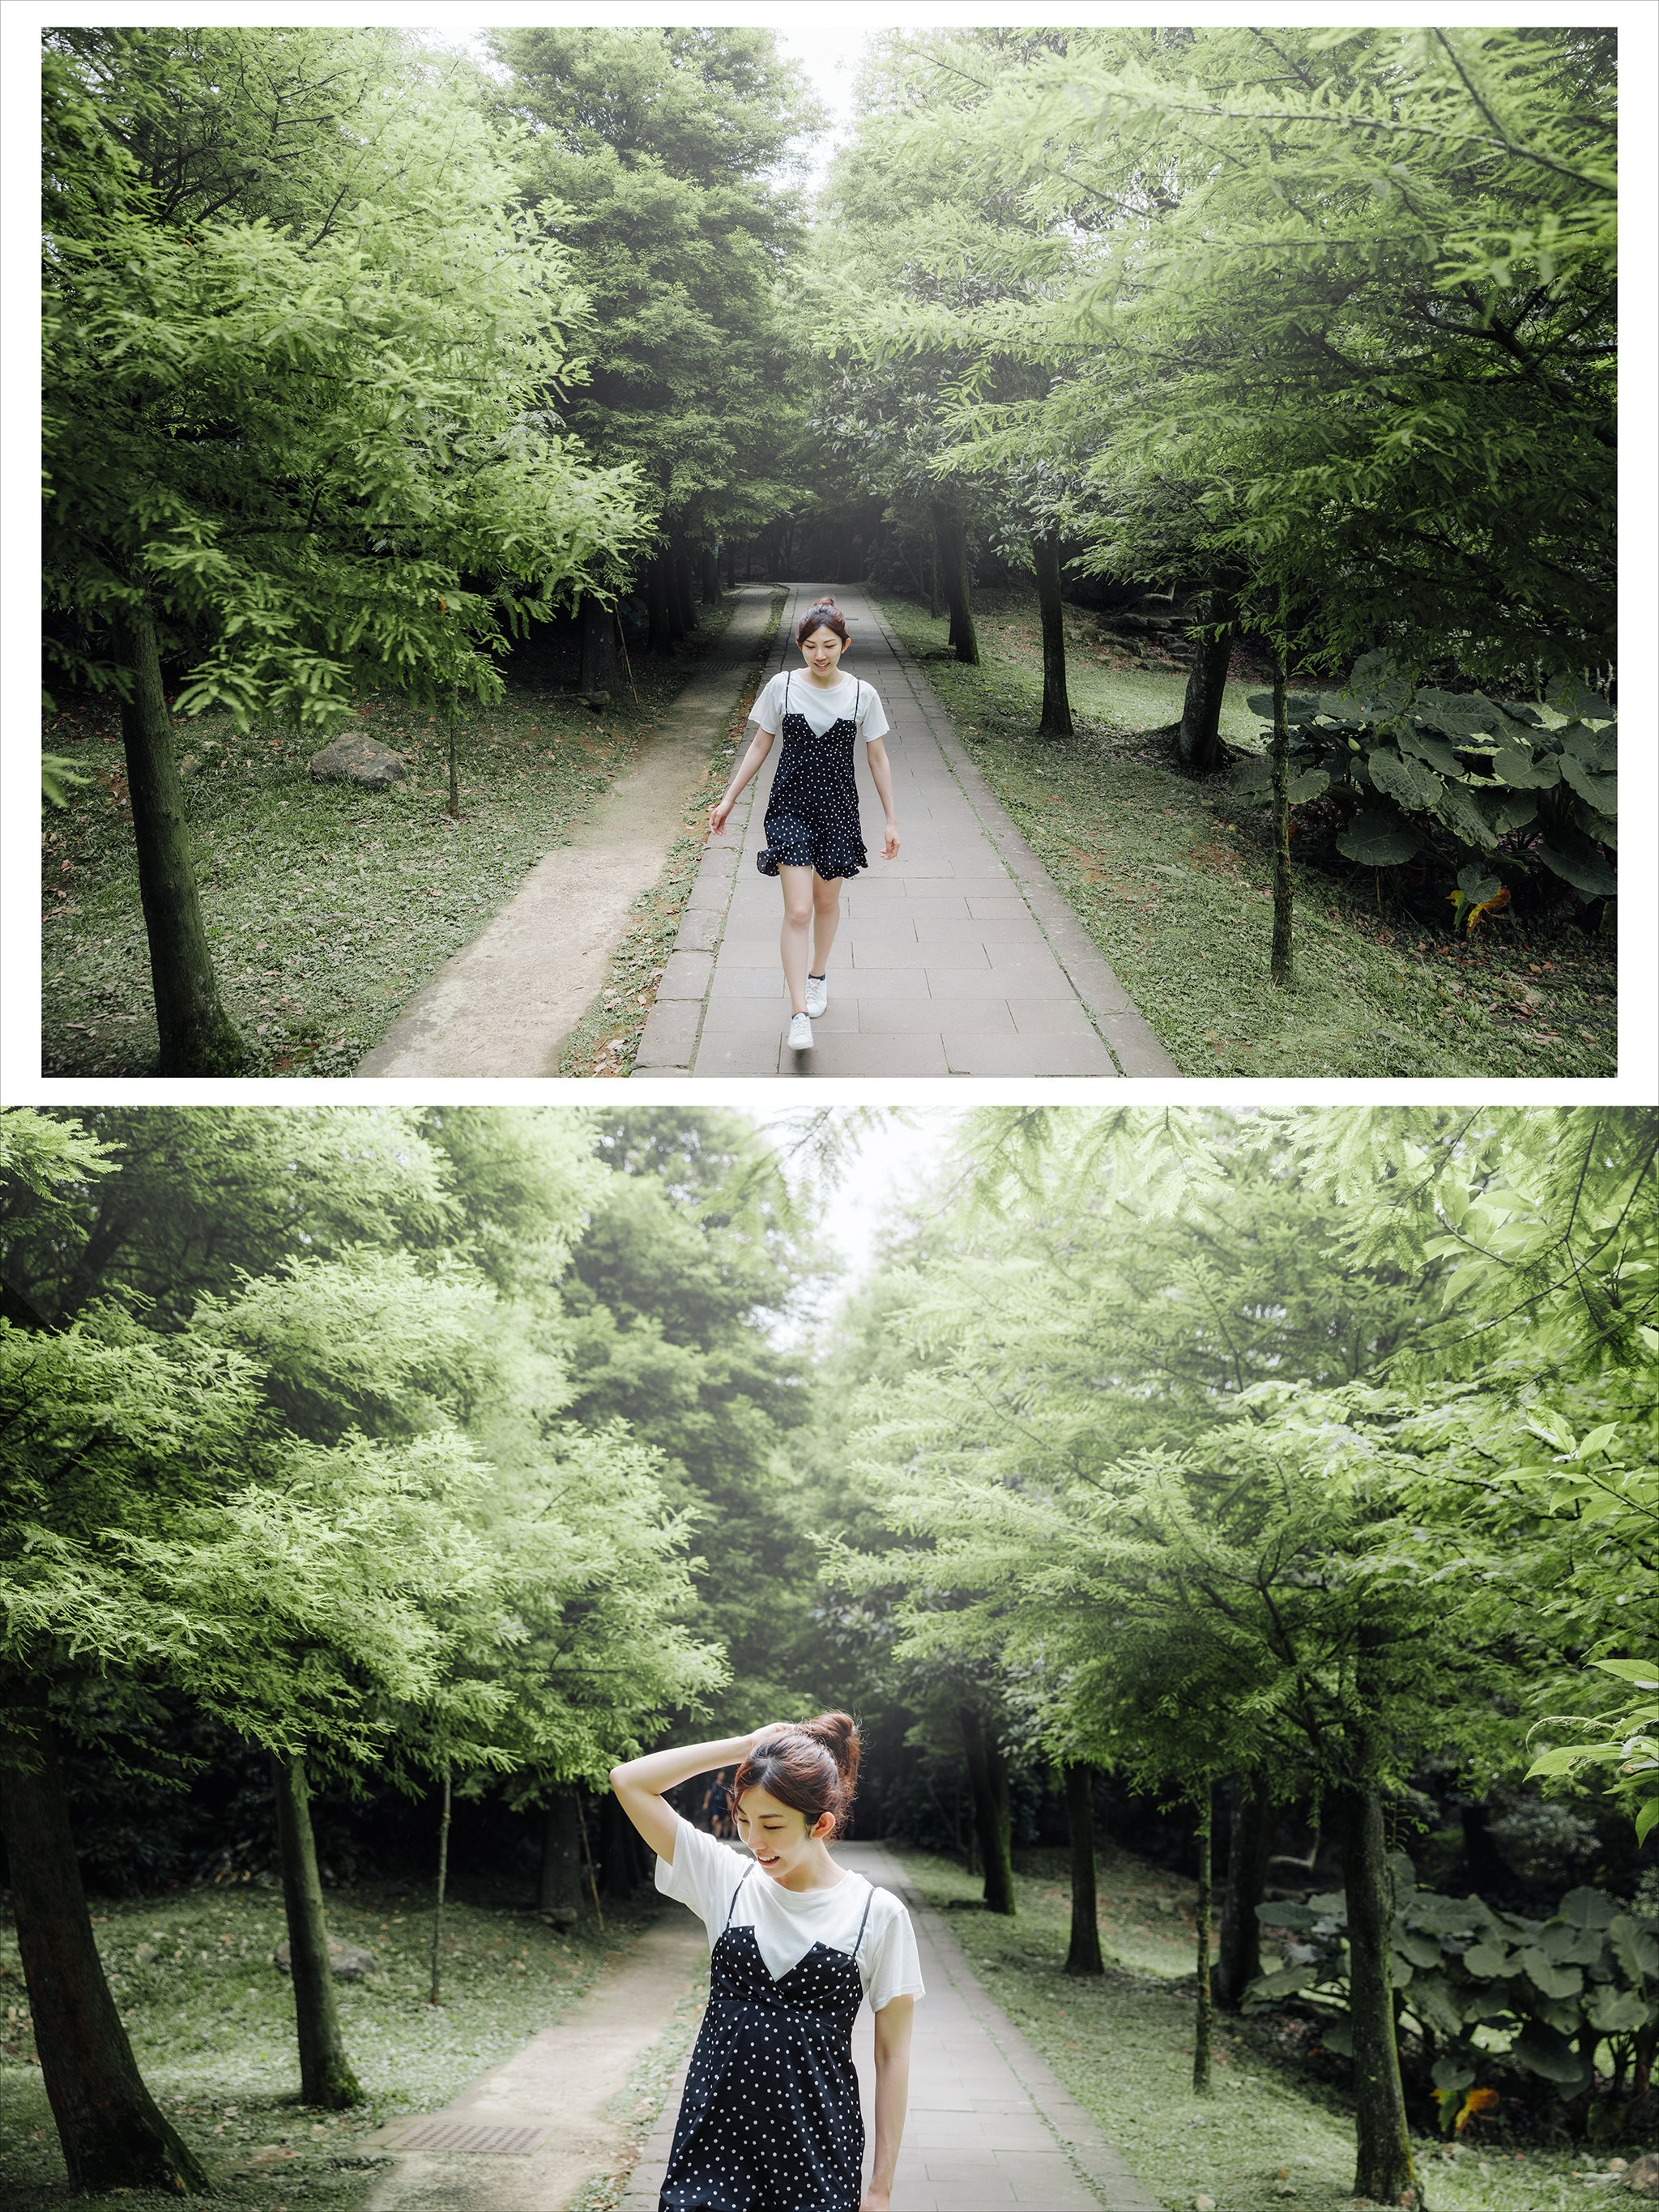 50030250106 45f442d0bd o - 【夏季寫真】+Shan+